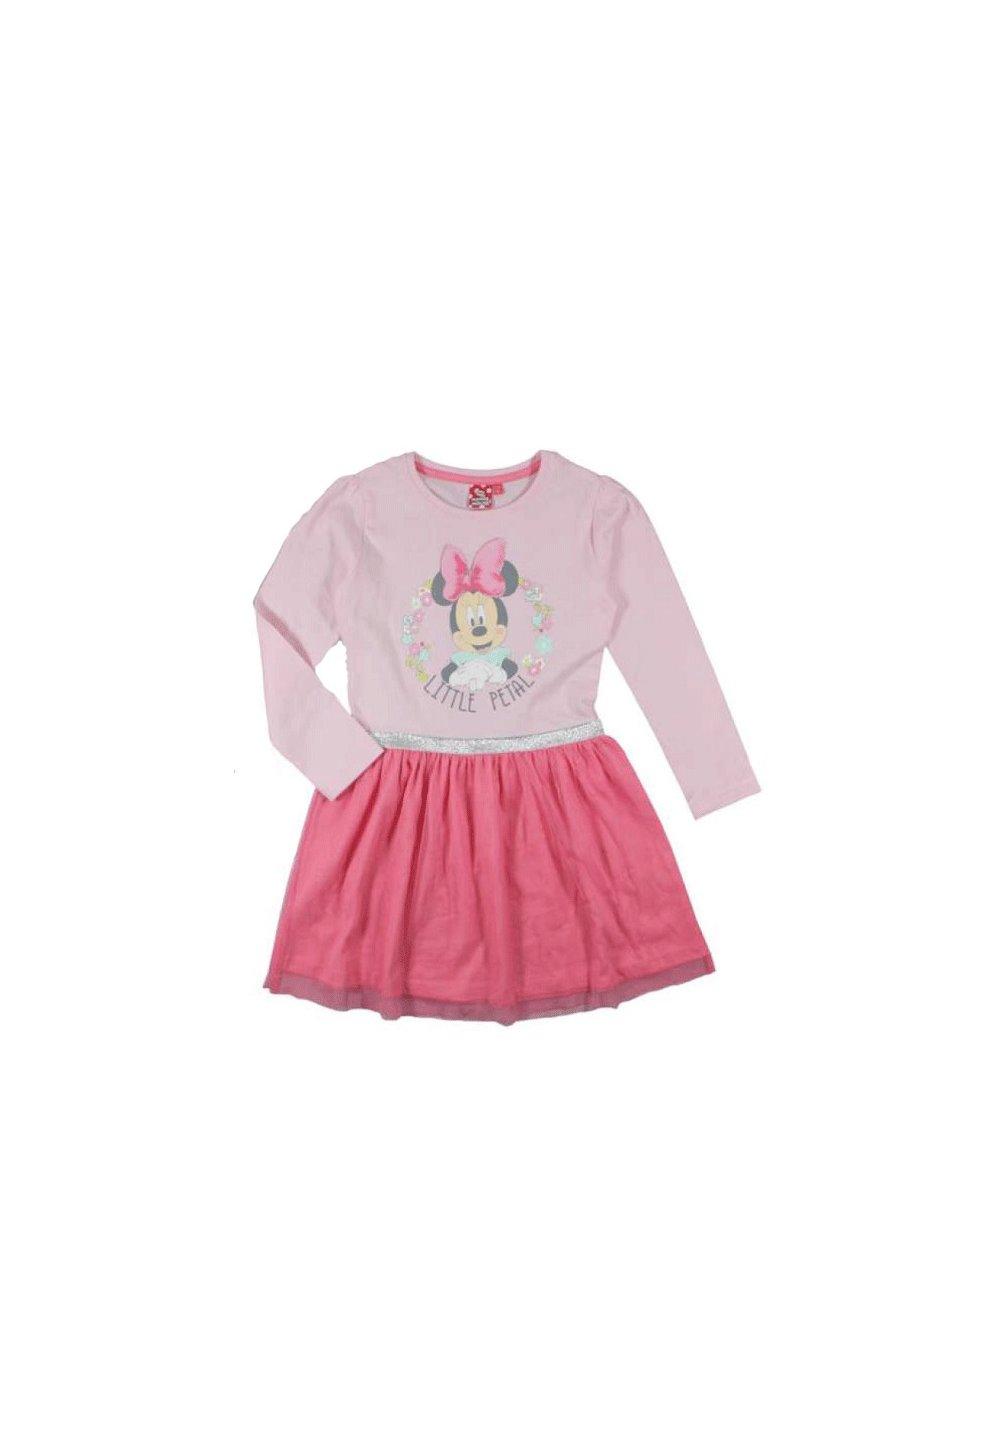 Rochie Minnie Mouse roz, maneca lunga imagine